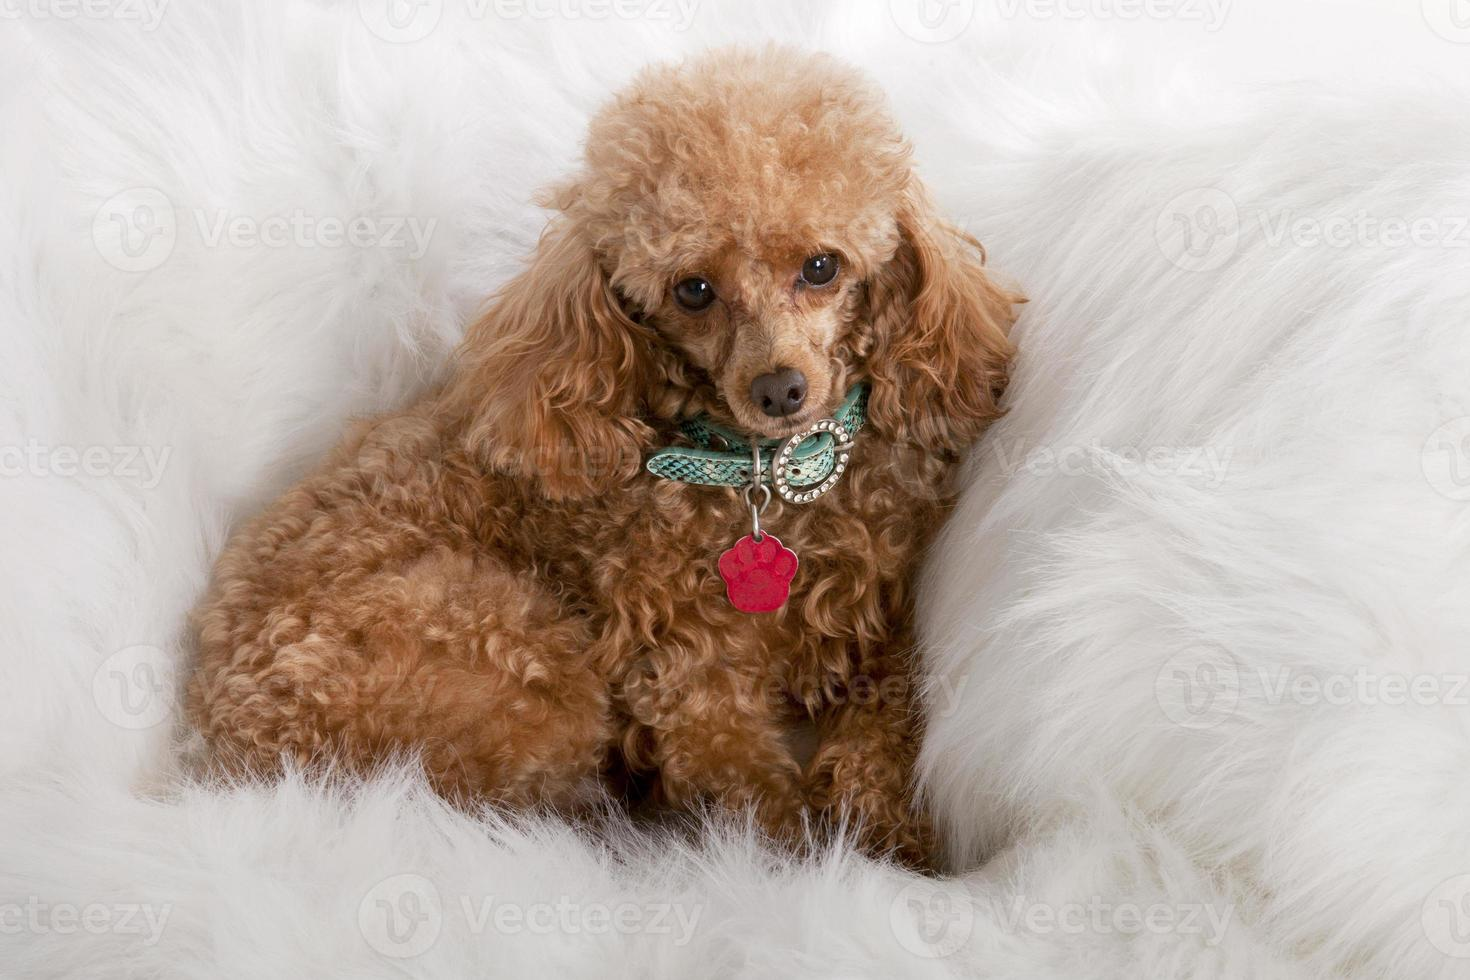 poodle toy foto